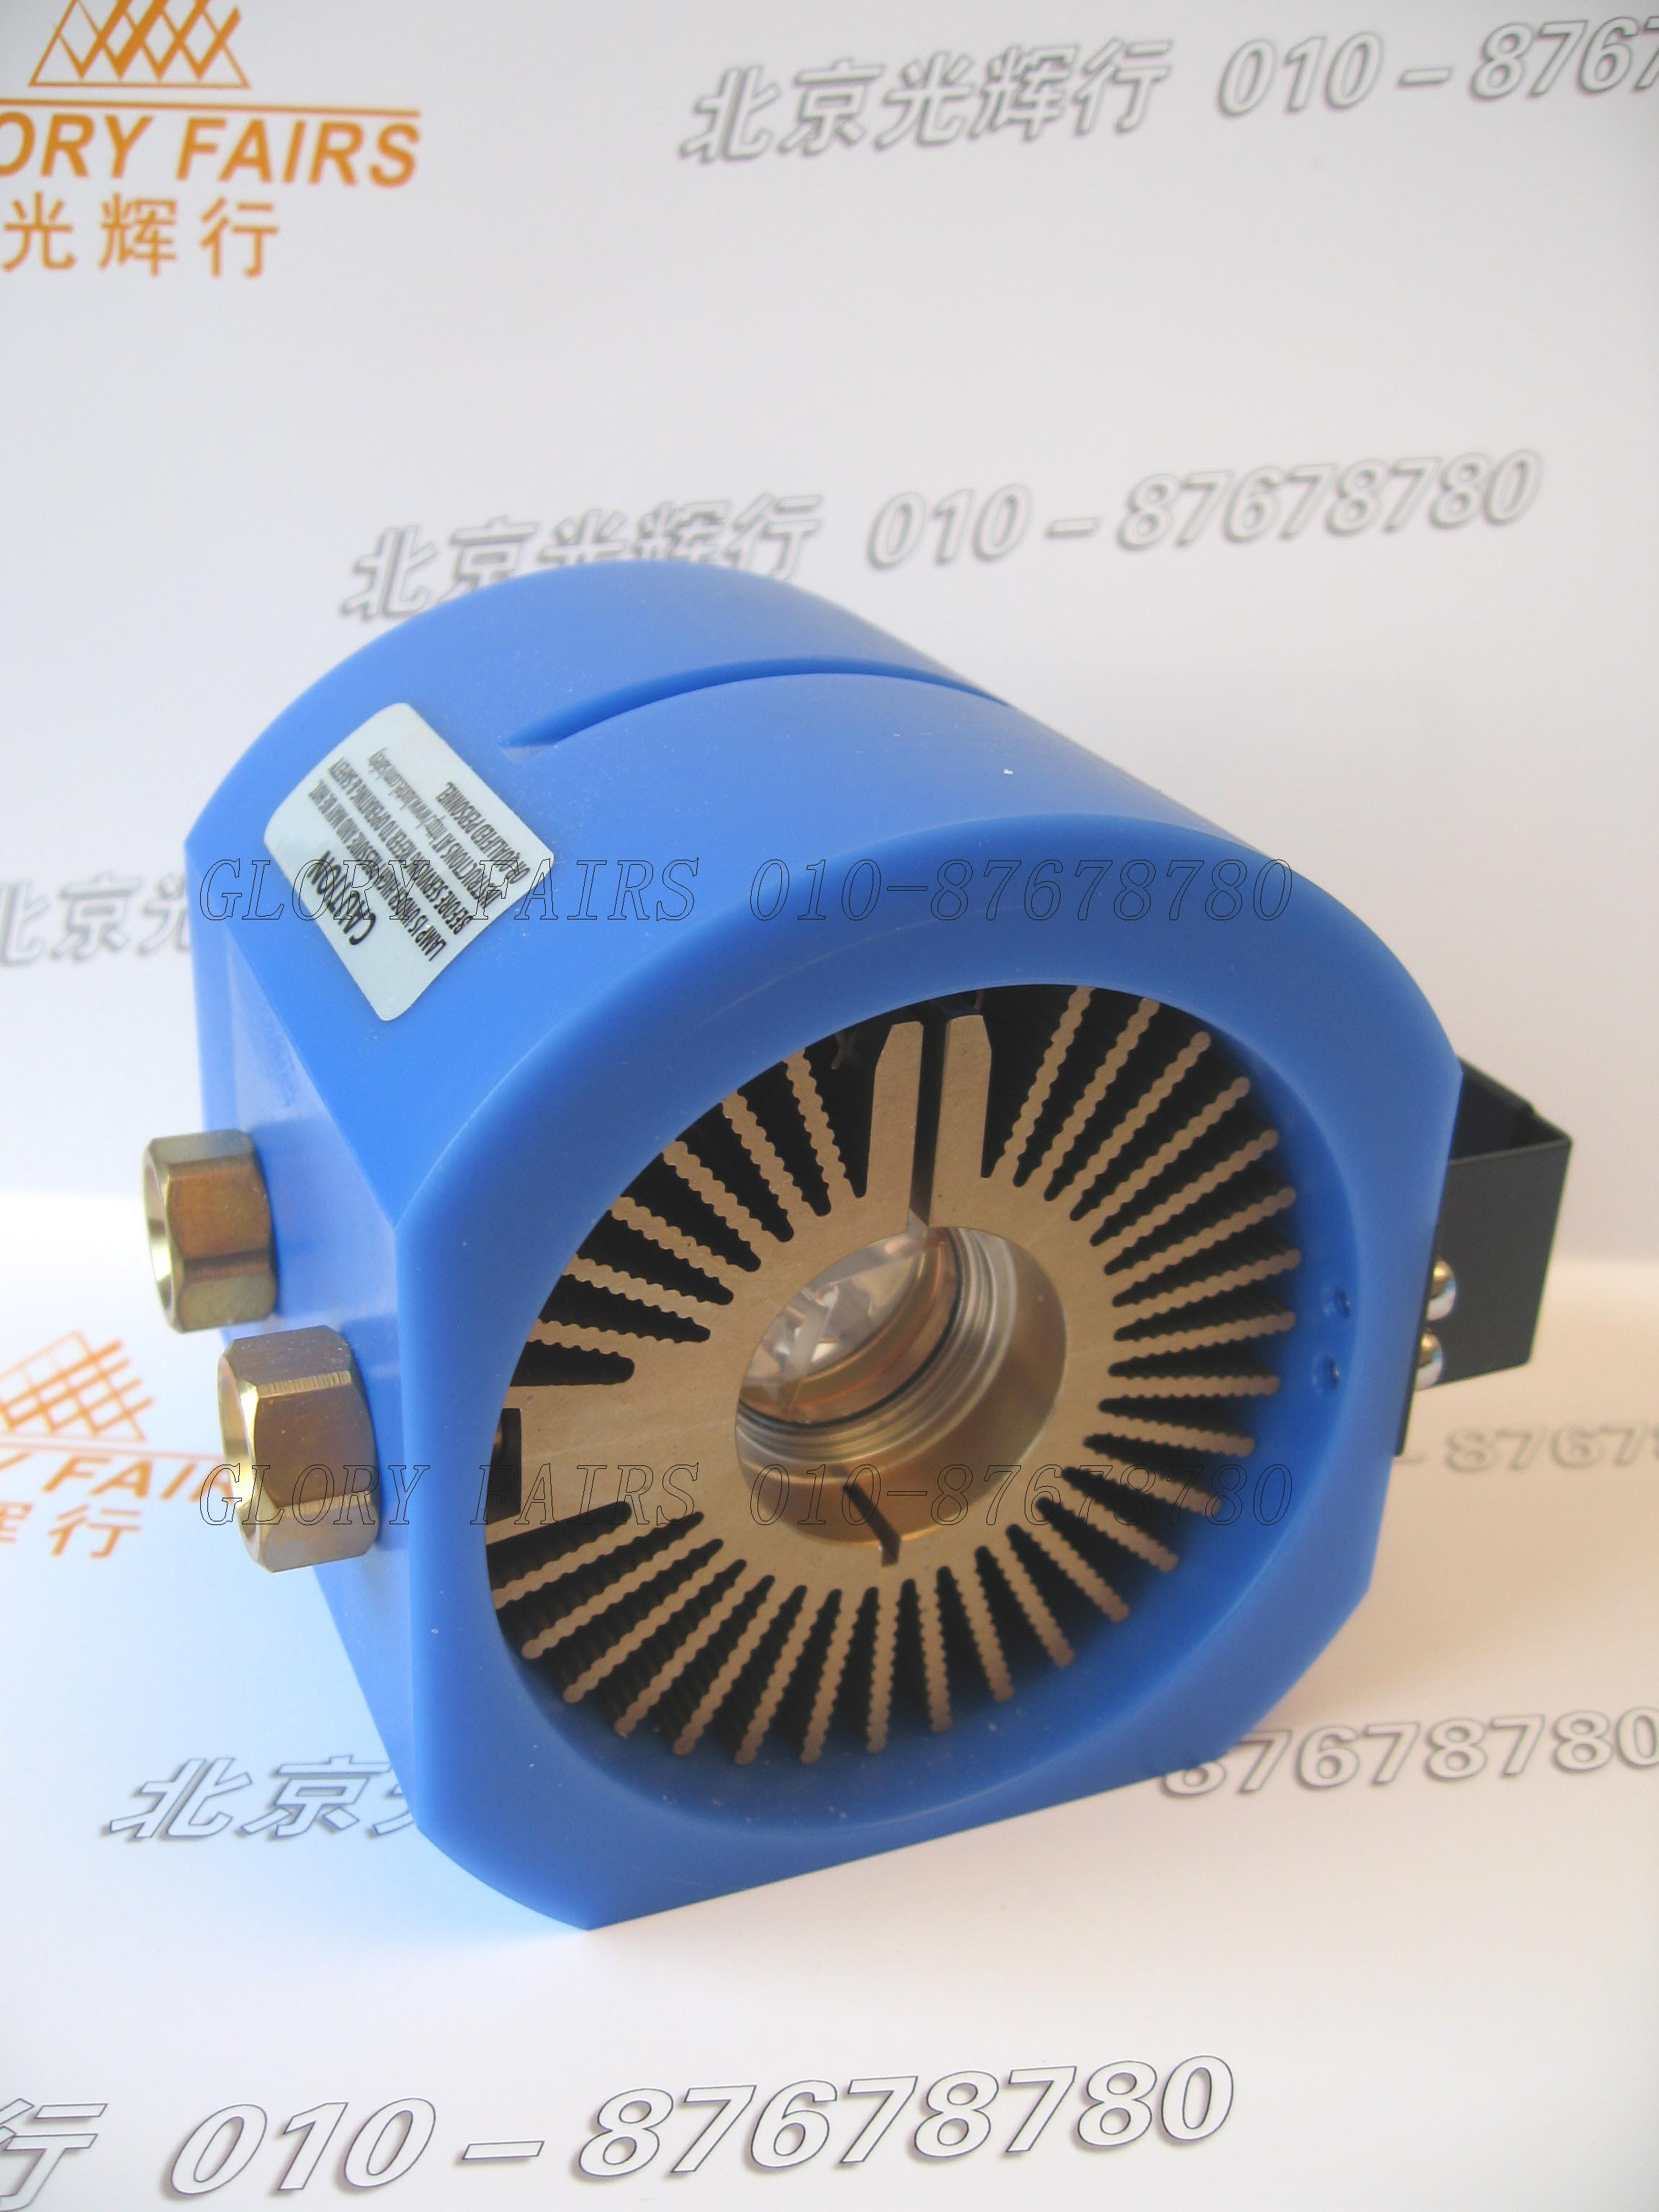 US $1100 0 |300W replacement xenon lamp module,Alternative Stryker X6000  endoscope light source,220 185 300 bulb unit heat sinker housing-in Xenon